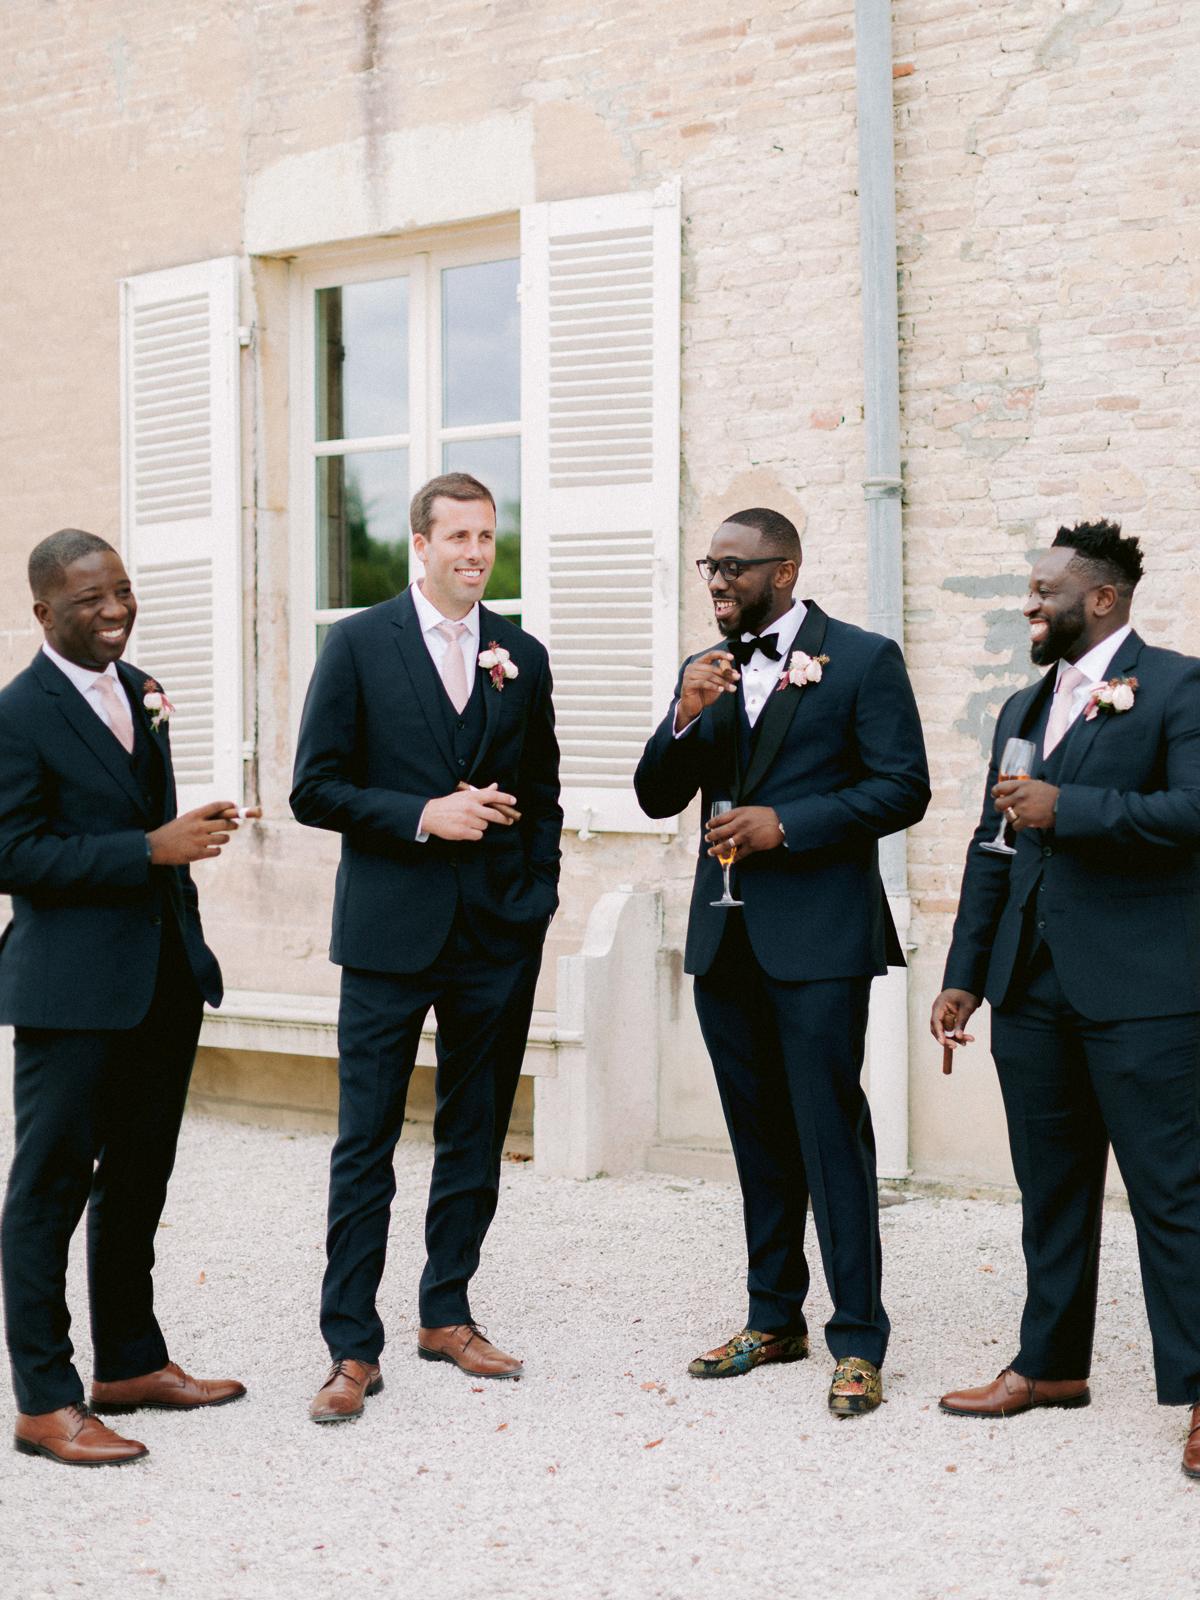 groom standing with groomsmen before wedding